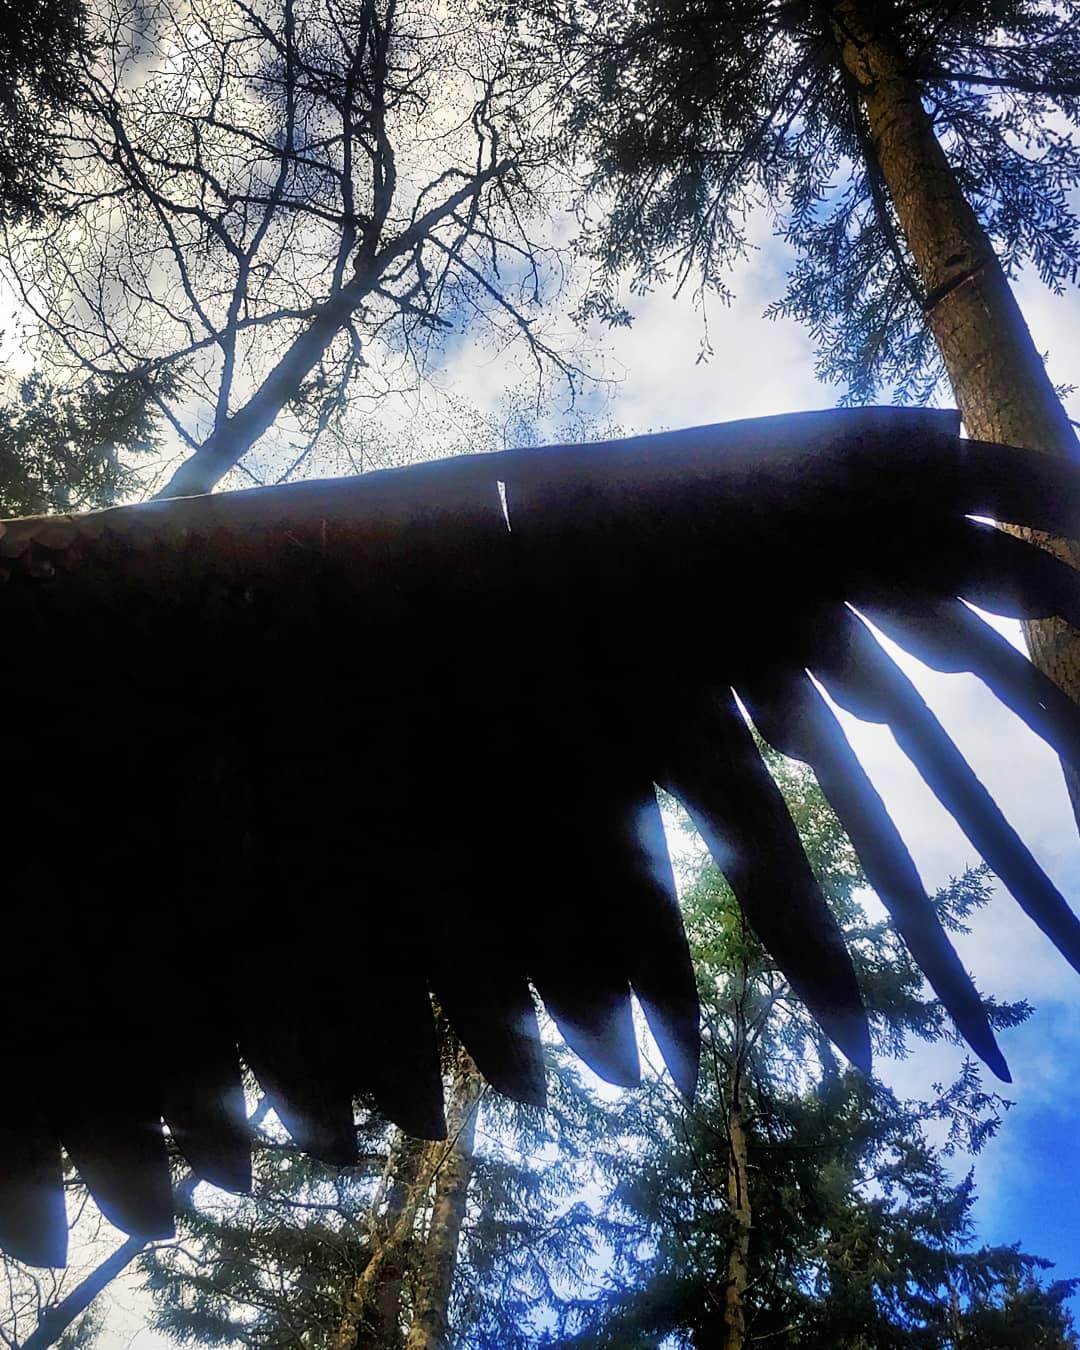 Greg Neal Attacking Eagle wing - photo by Shannon Nicole Bobo of Greenbank WA